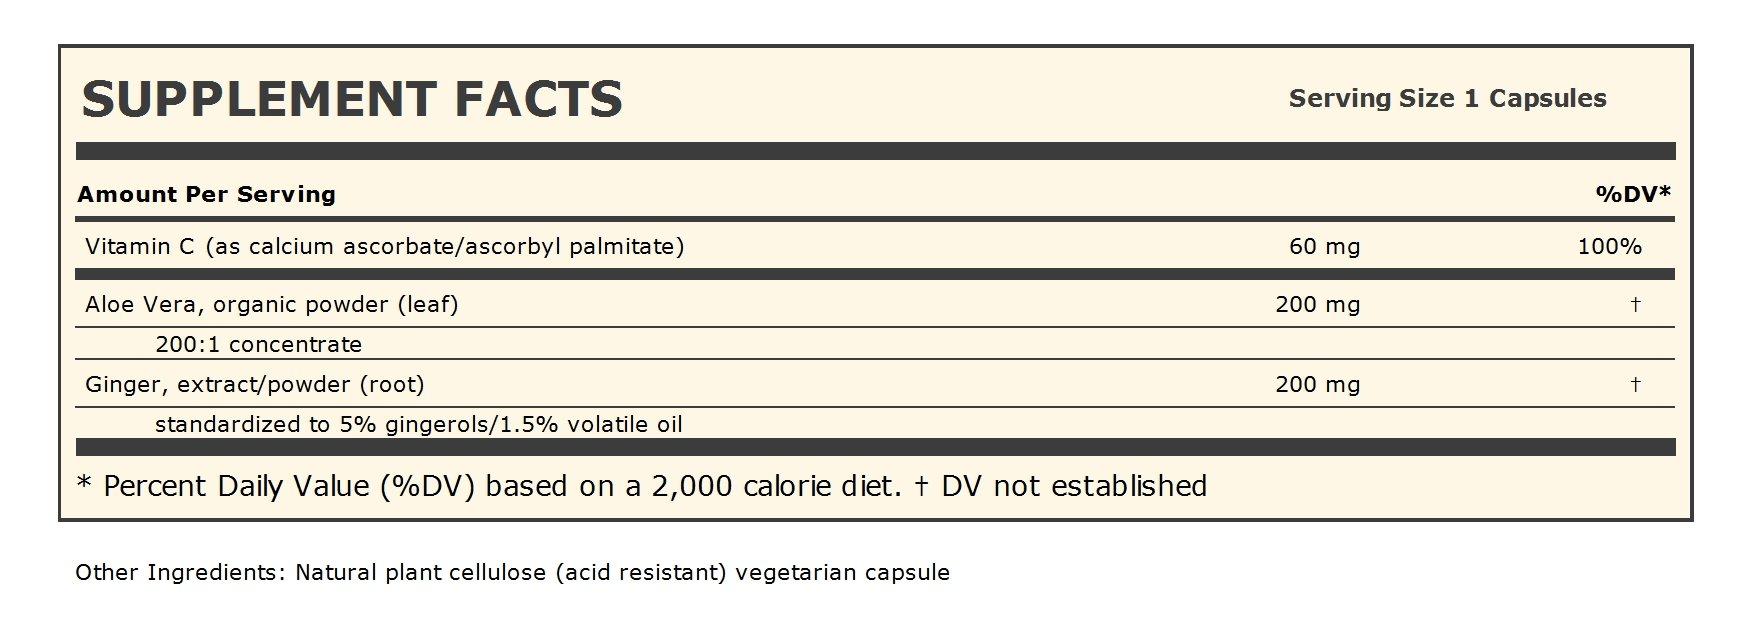 Andrew Lessman Aloe Vera 200 Ginger Root 200, 60 Capsules